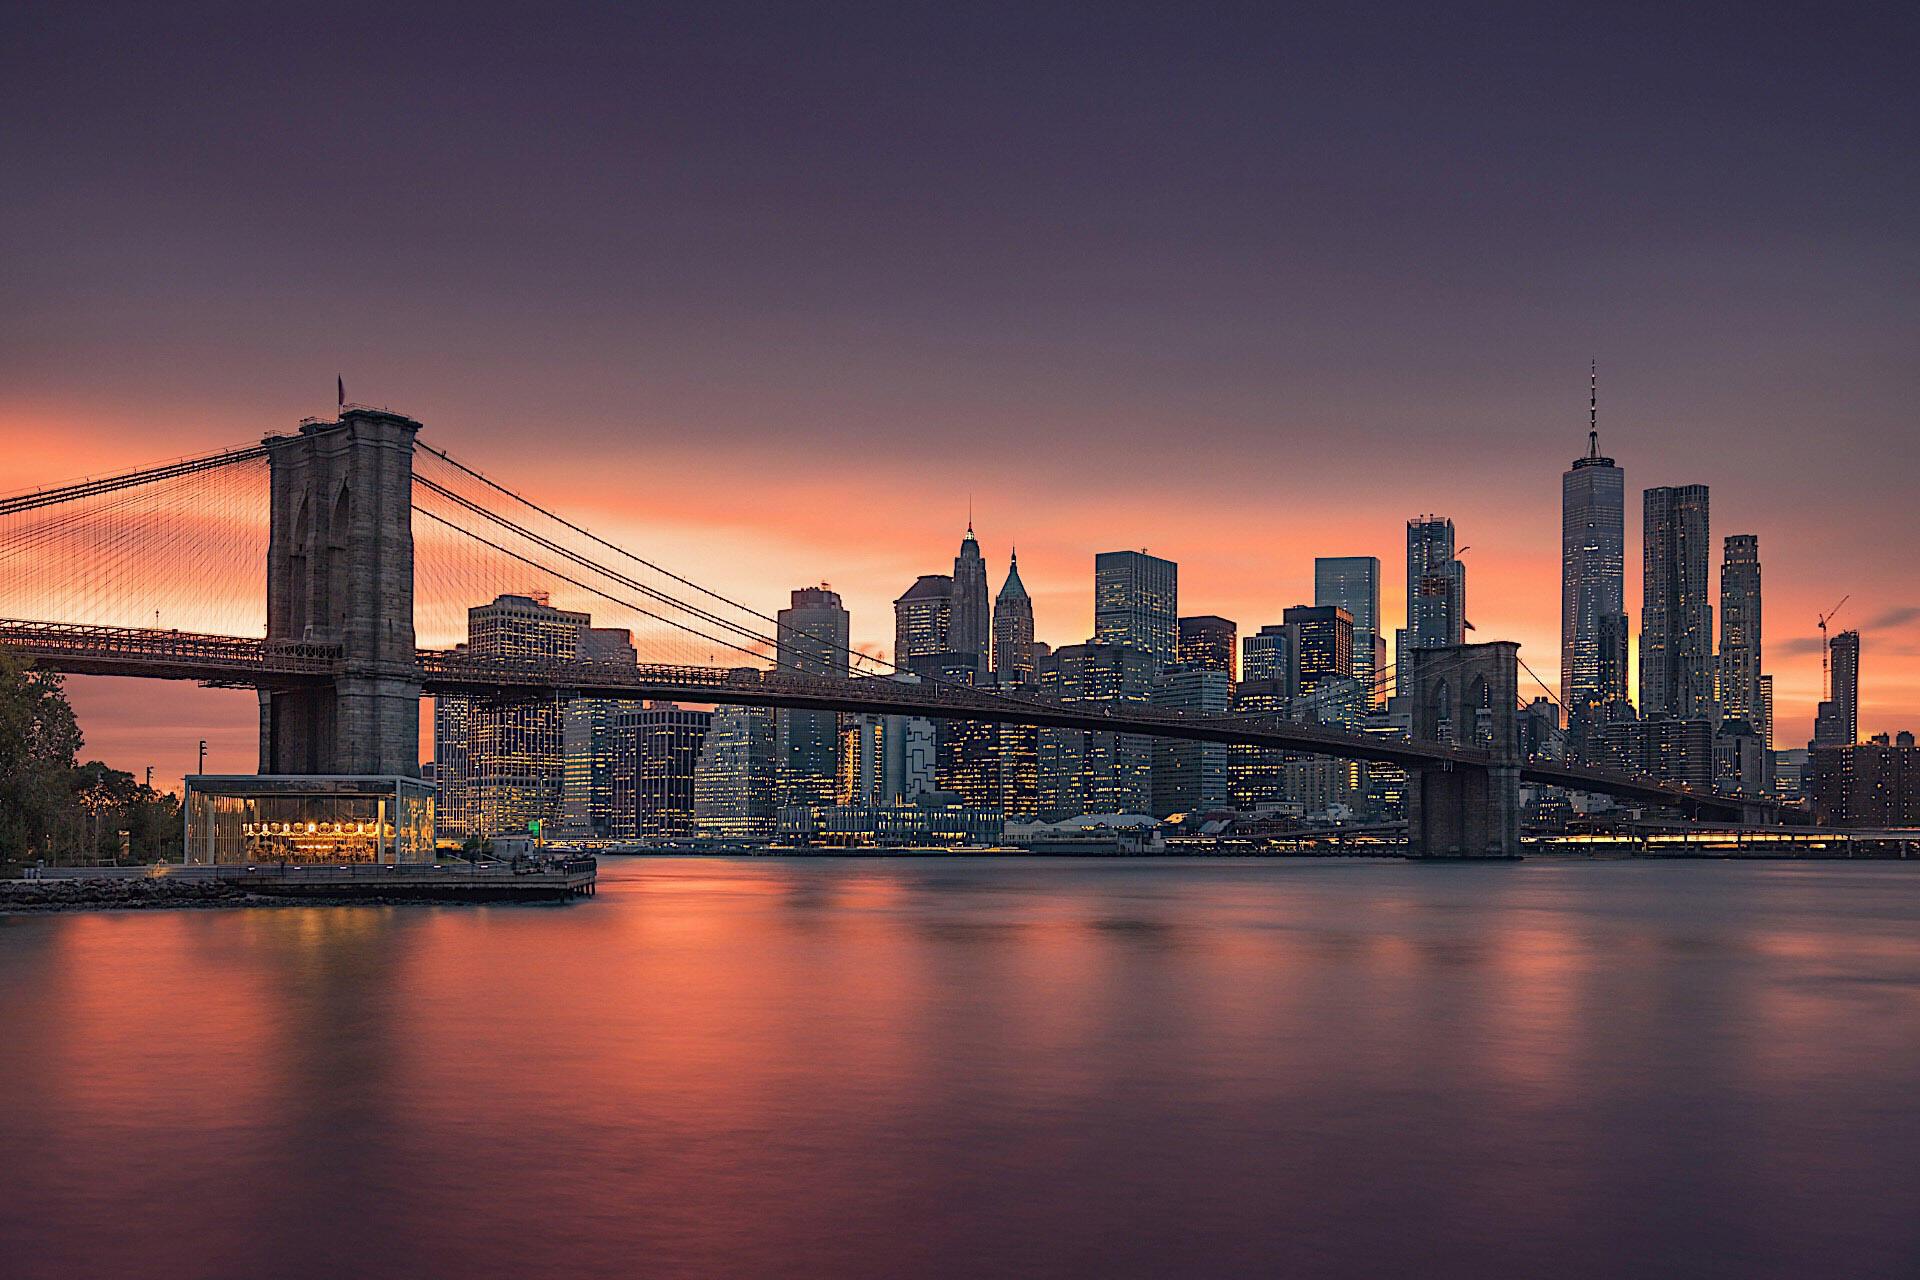 Sunset and bridge in New York